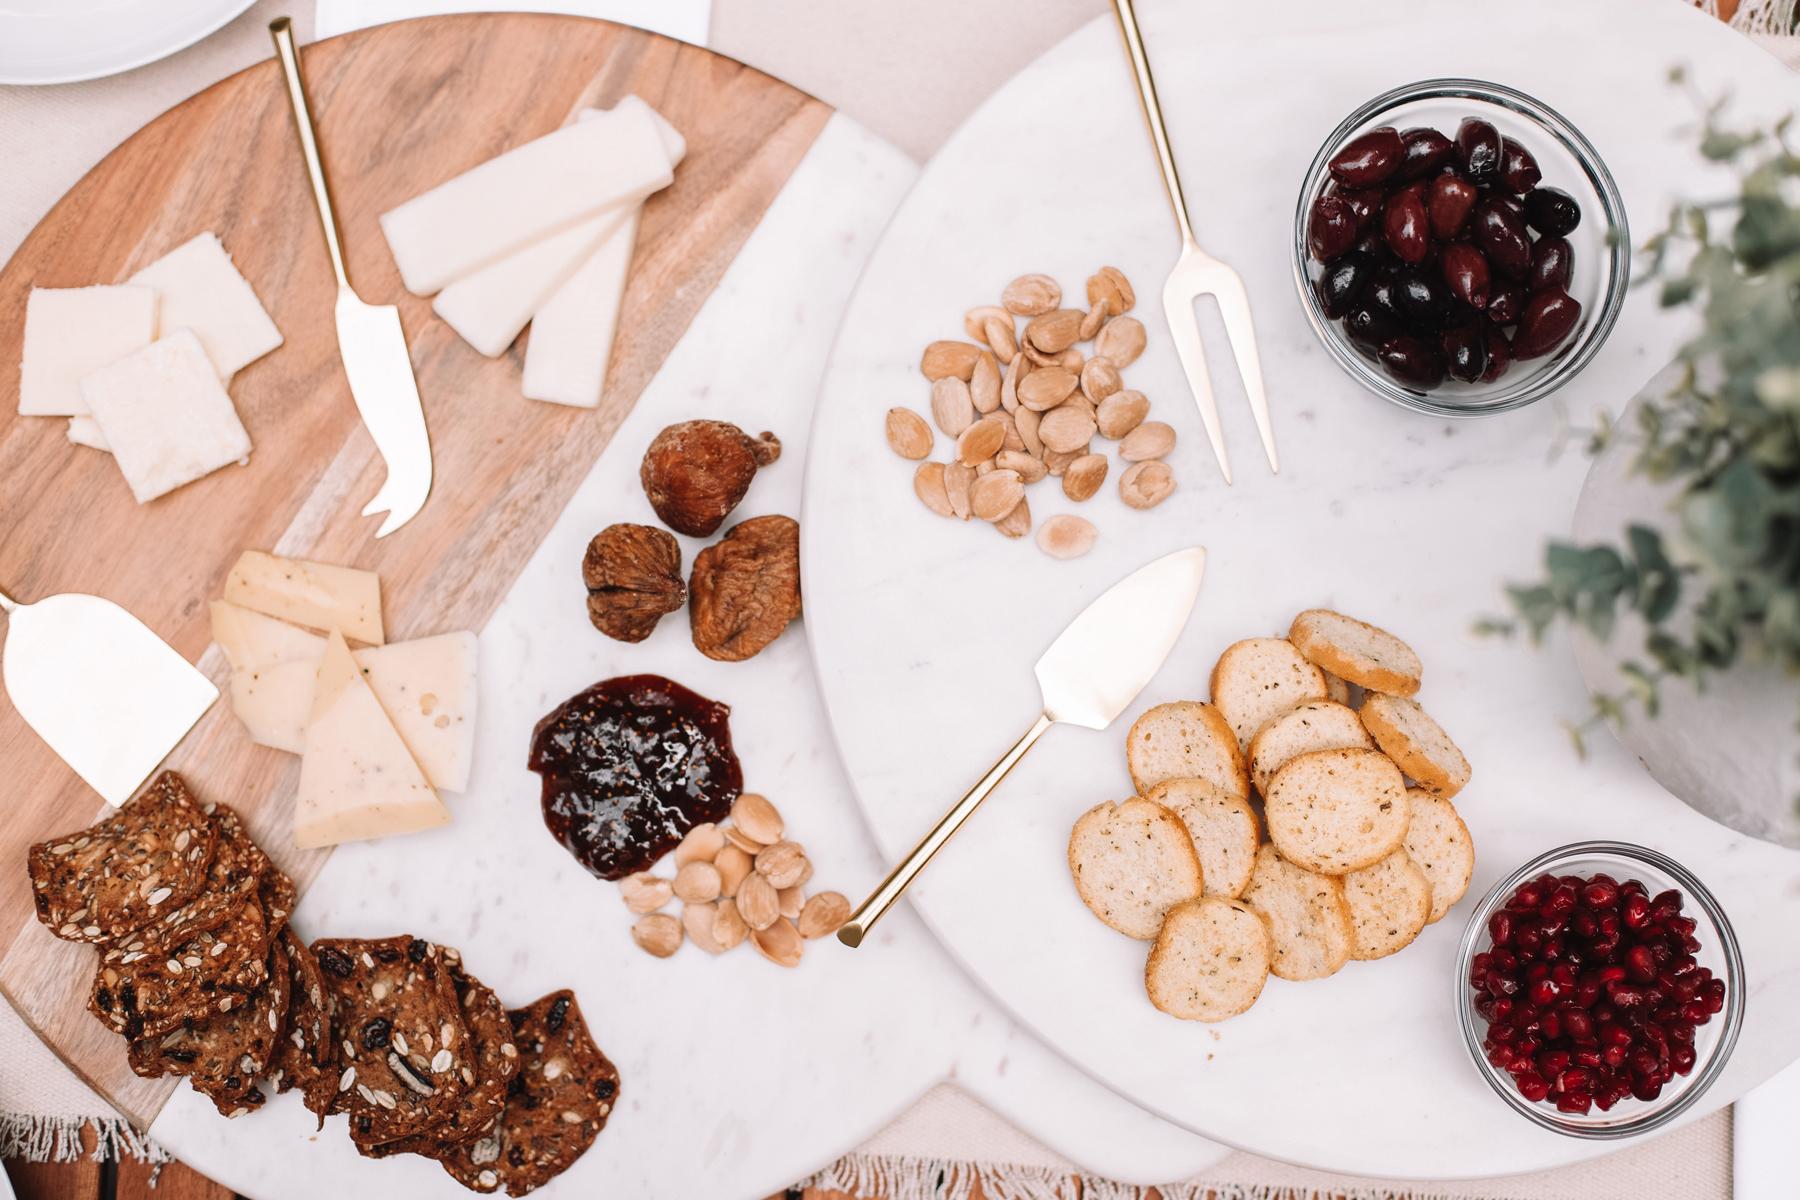 Fashion Jackson Patio Decor Nordstrom Anniversary Sale Home Decor Marble Cheese Board 1